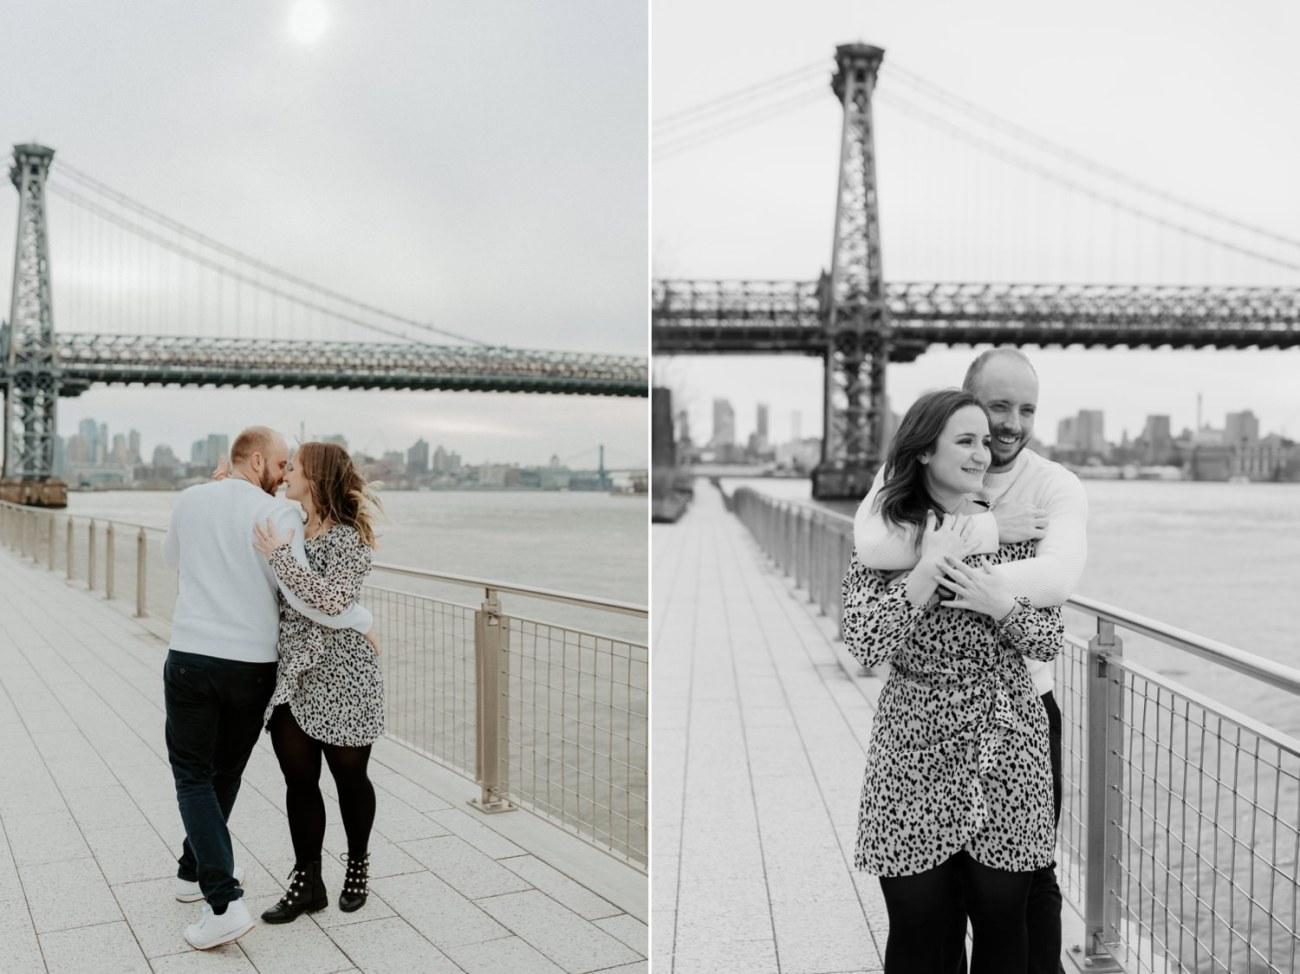 Williamsburg Brooklyn Couple Session Brooklyn Bridge Couple Photos Anais Possamai Photography 09